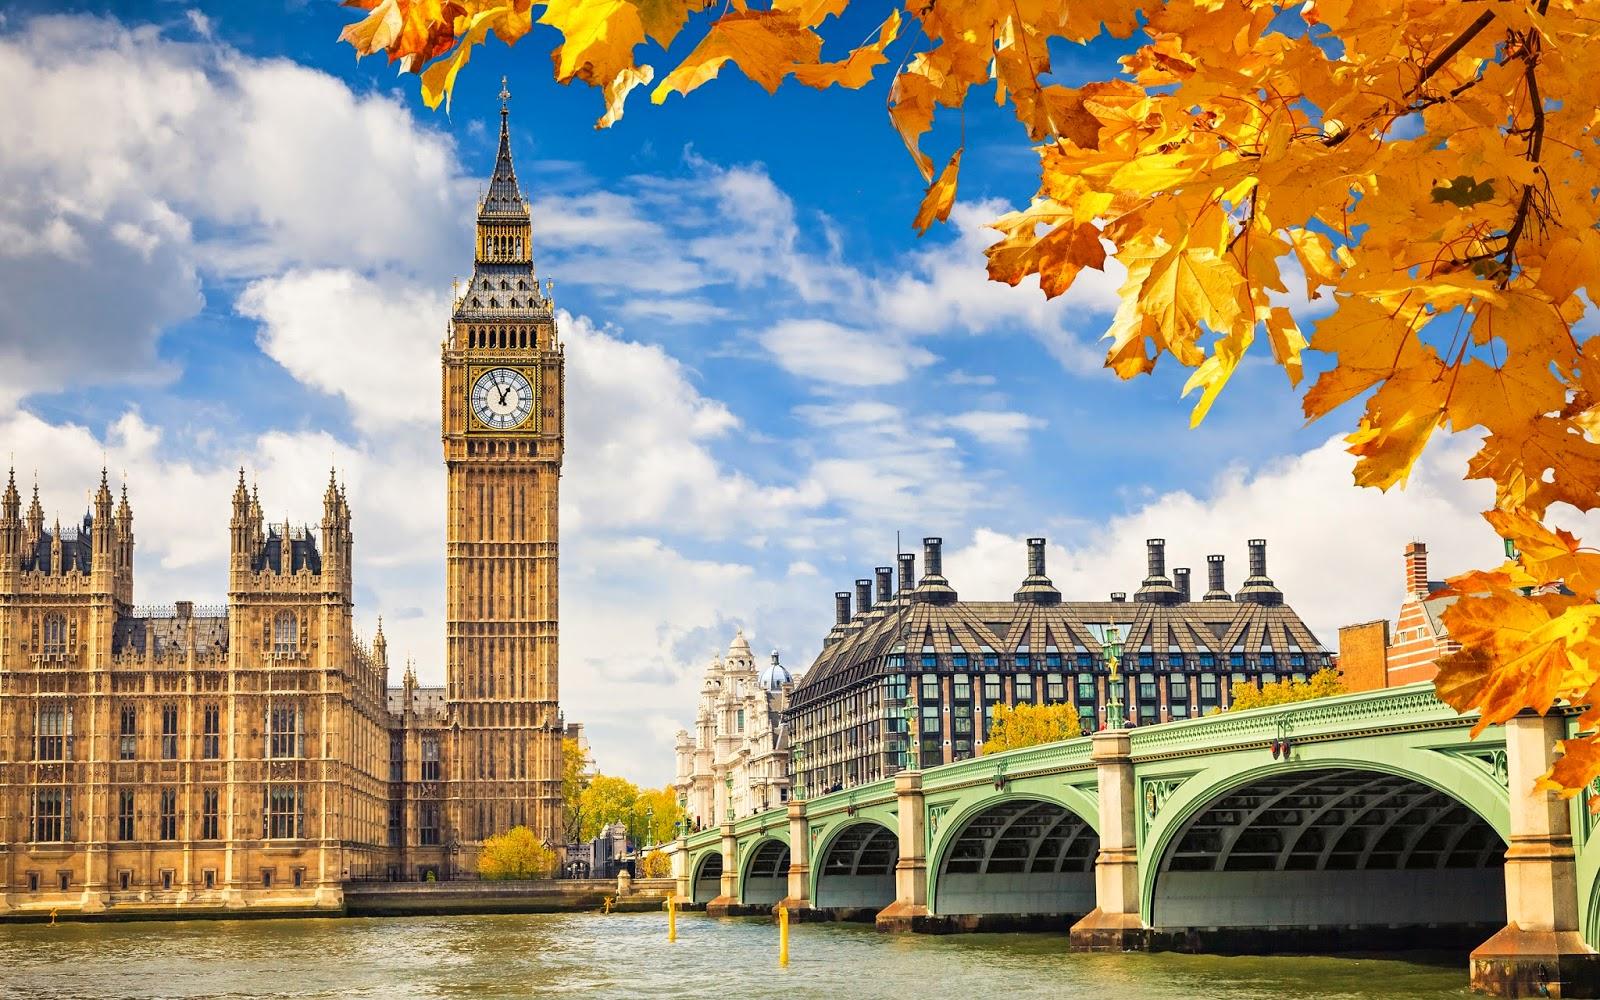 LONDON BIG BEN HD Wallpaper For Desktop of PC Download HD Wallpapers 1600x1000